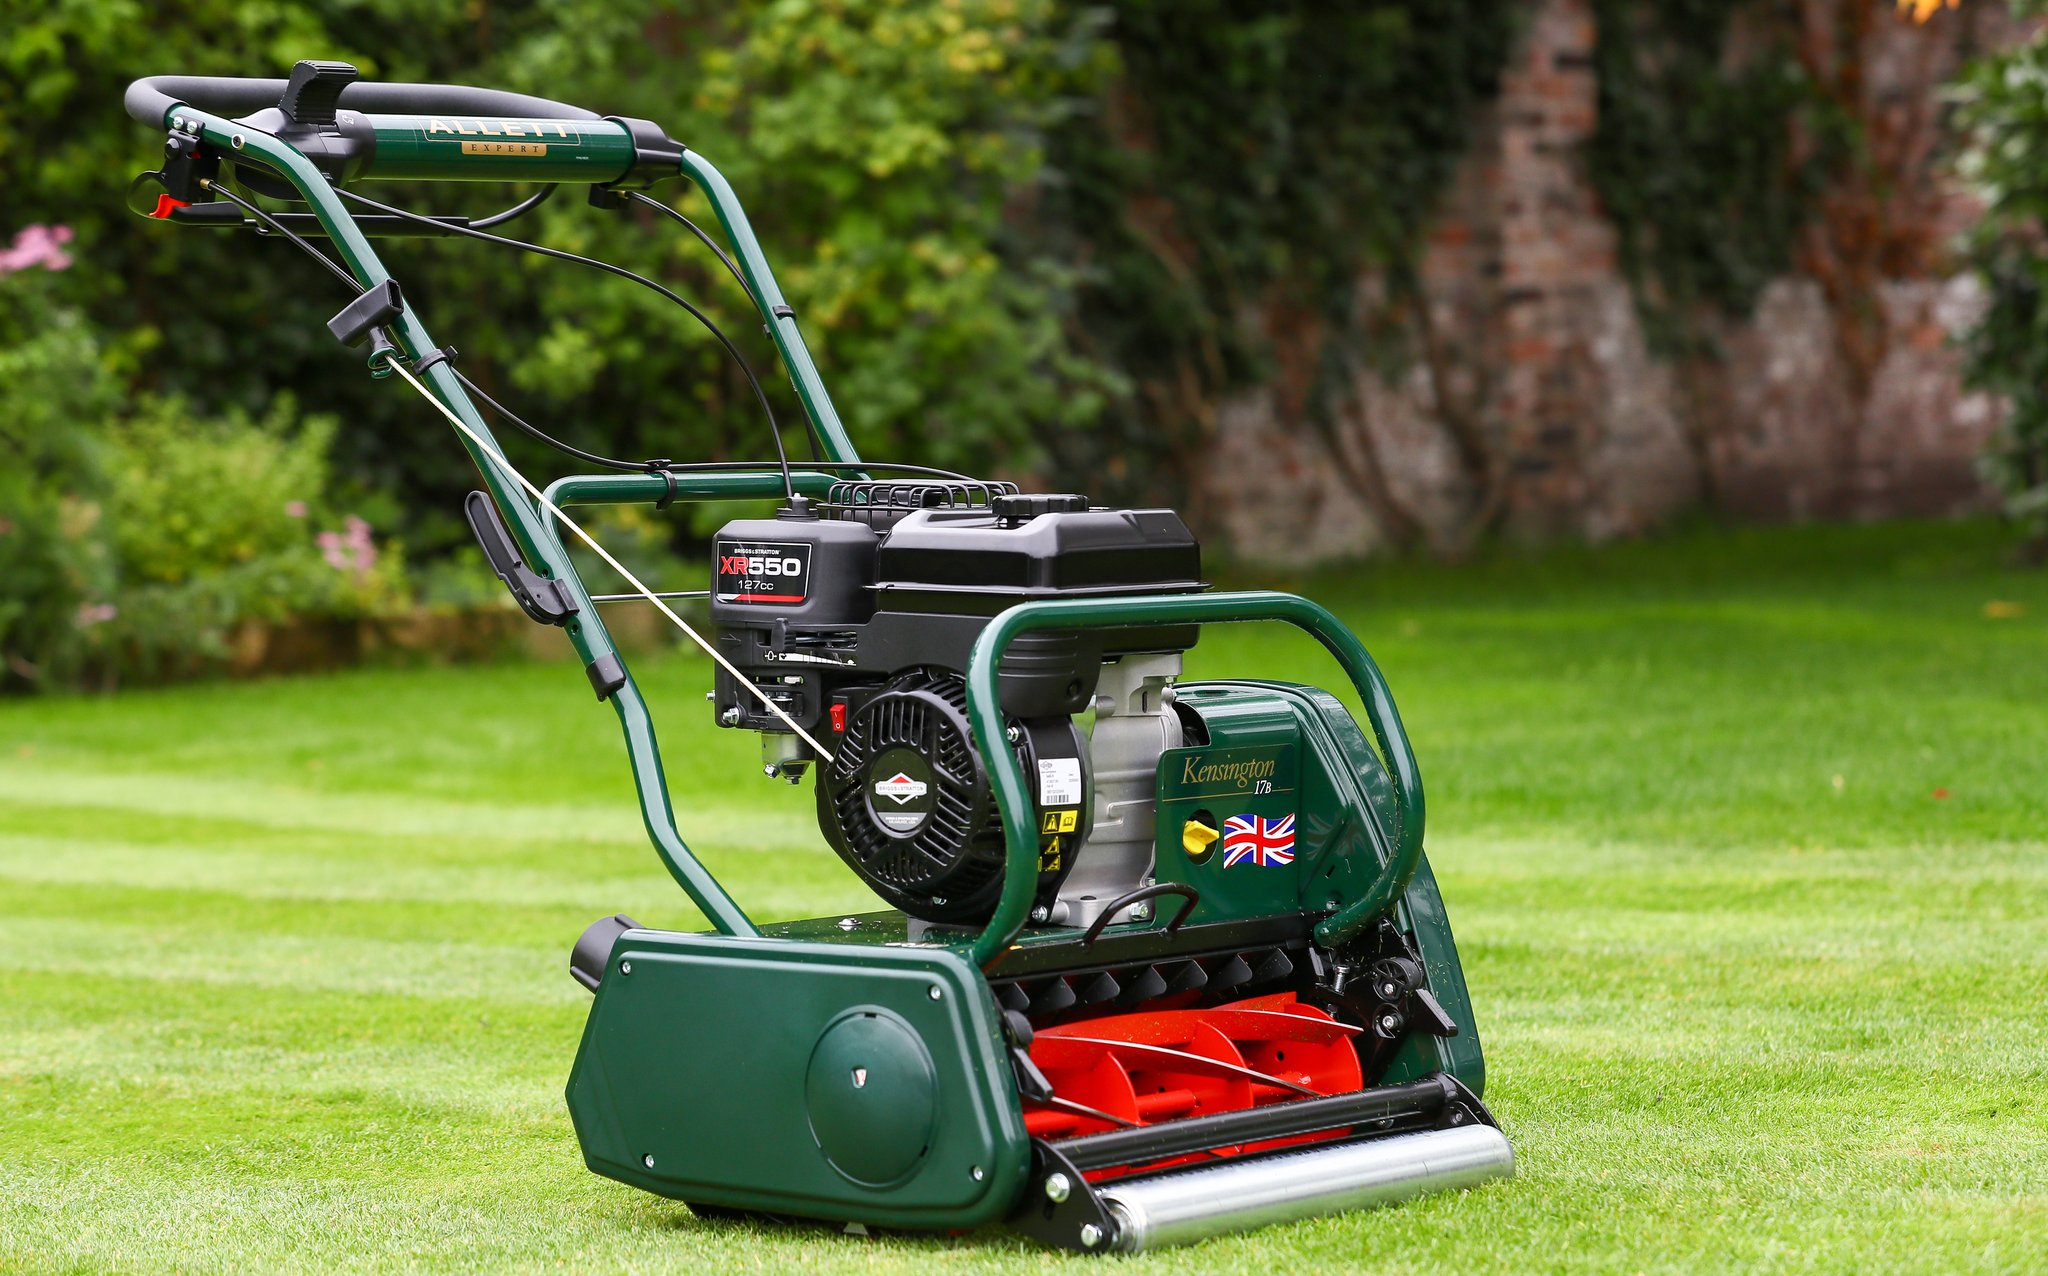 Allett Kensington 17B Petrol Cylinder Mower | Plymouth Garden Machinery